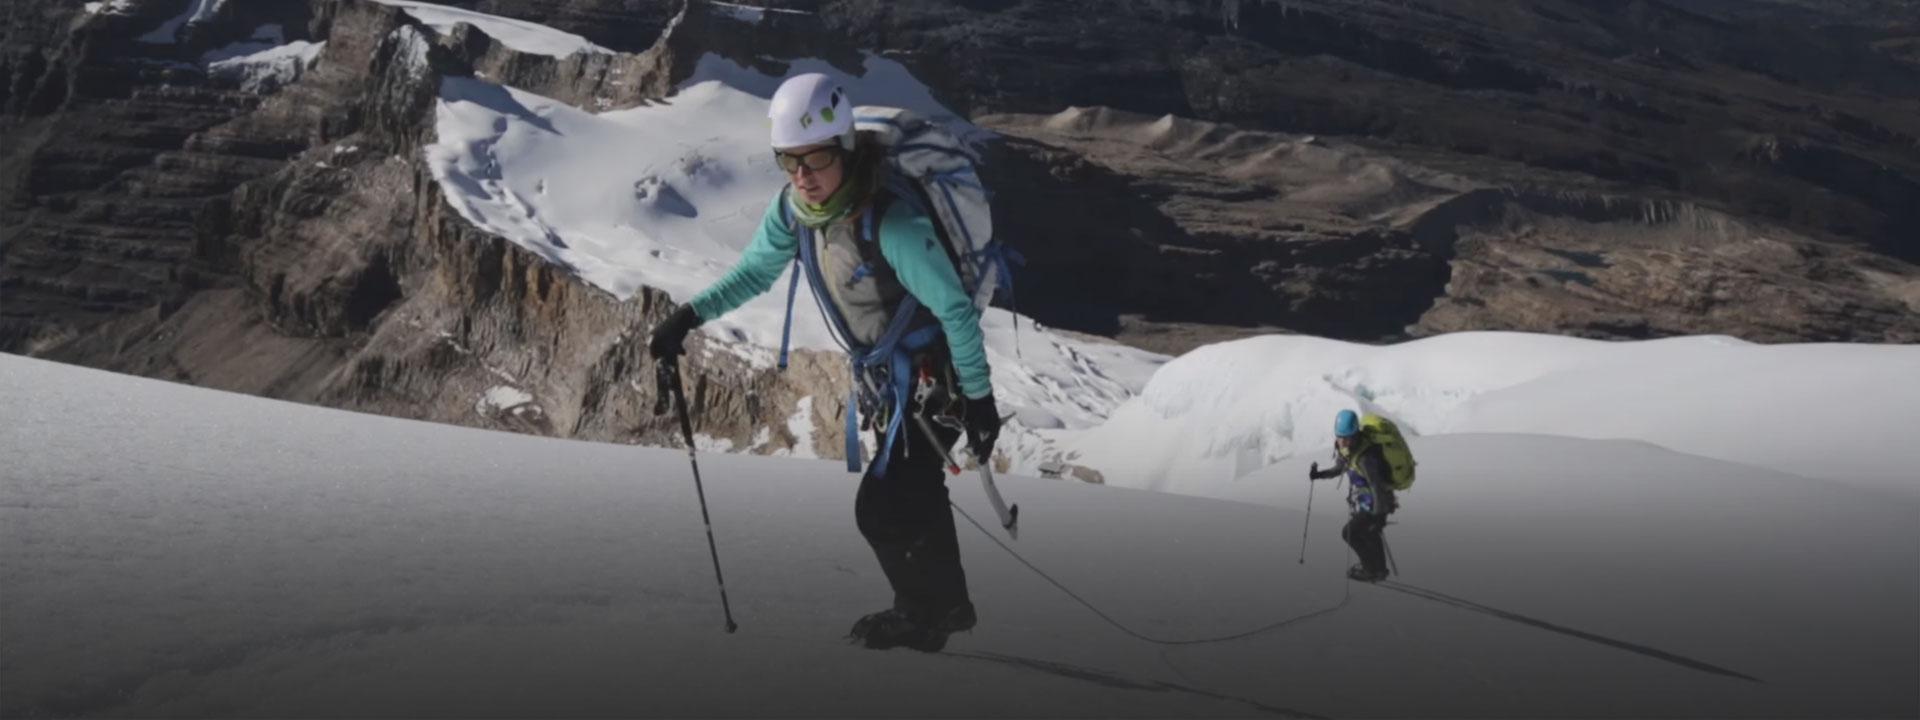 Woman climbing snowy mountain, learn about 50 Peak Challenge